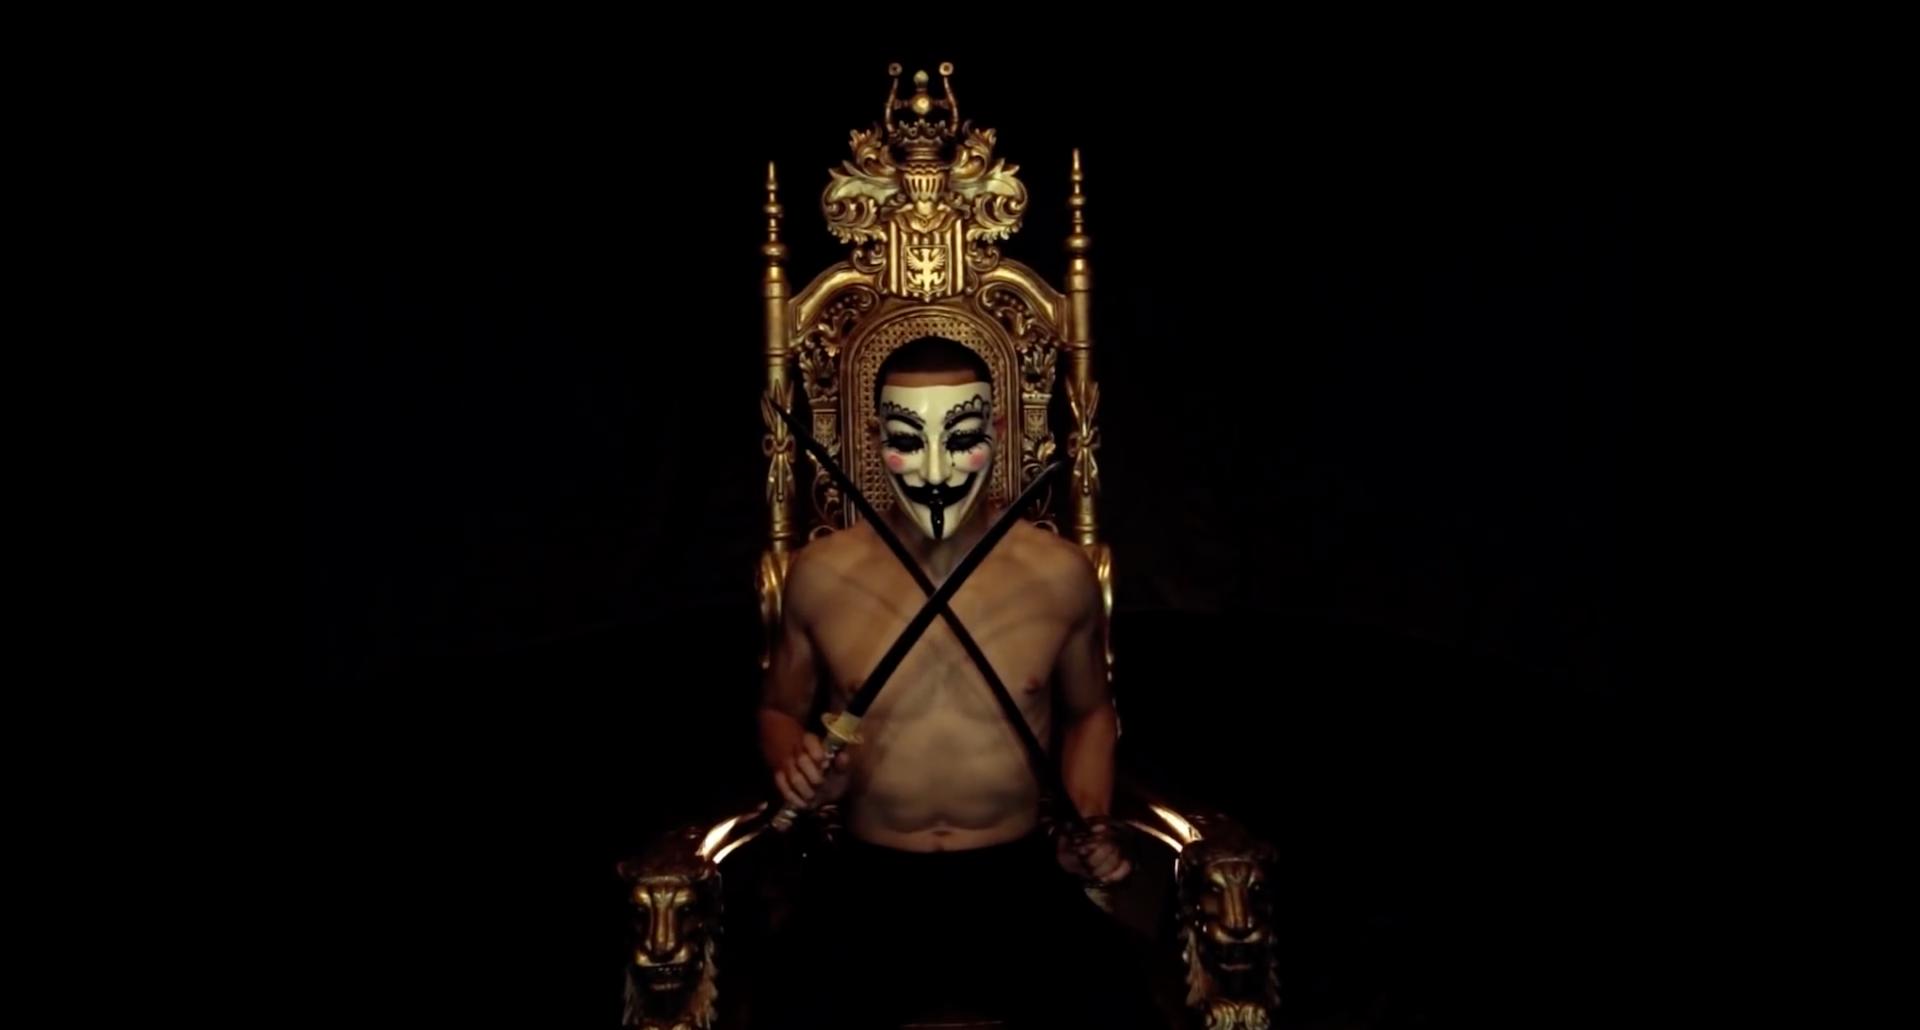 RIGAMERKTHIS - MUSIC VIDEO